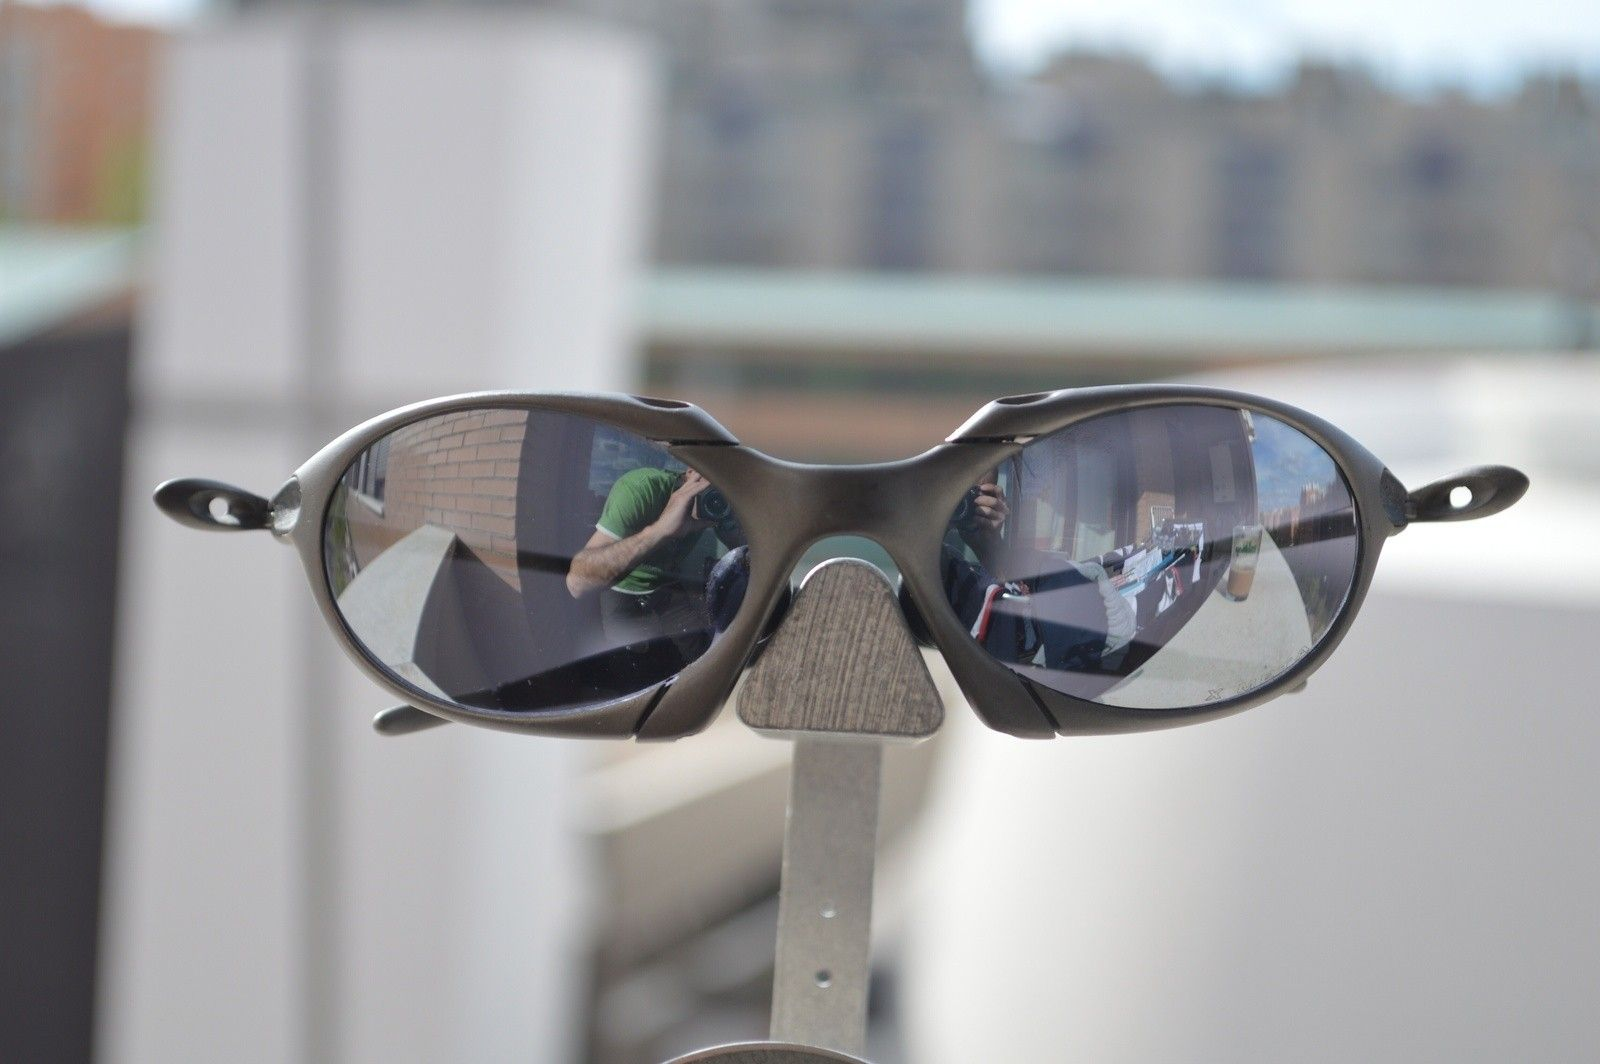 Romeo 1 black iridium OEM Lenses only #SOLD - image.jpg